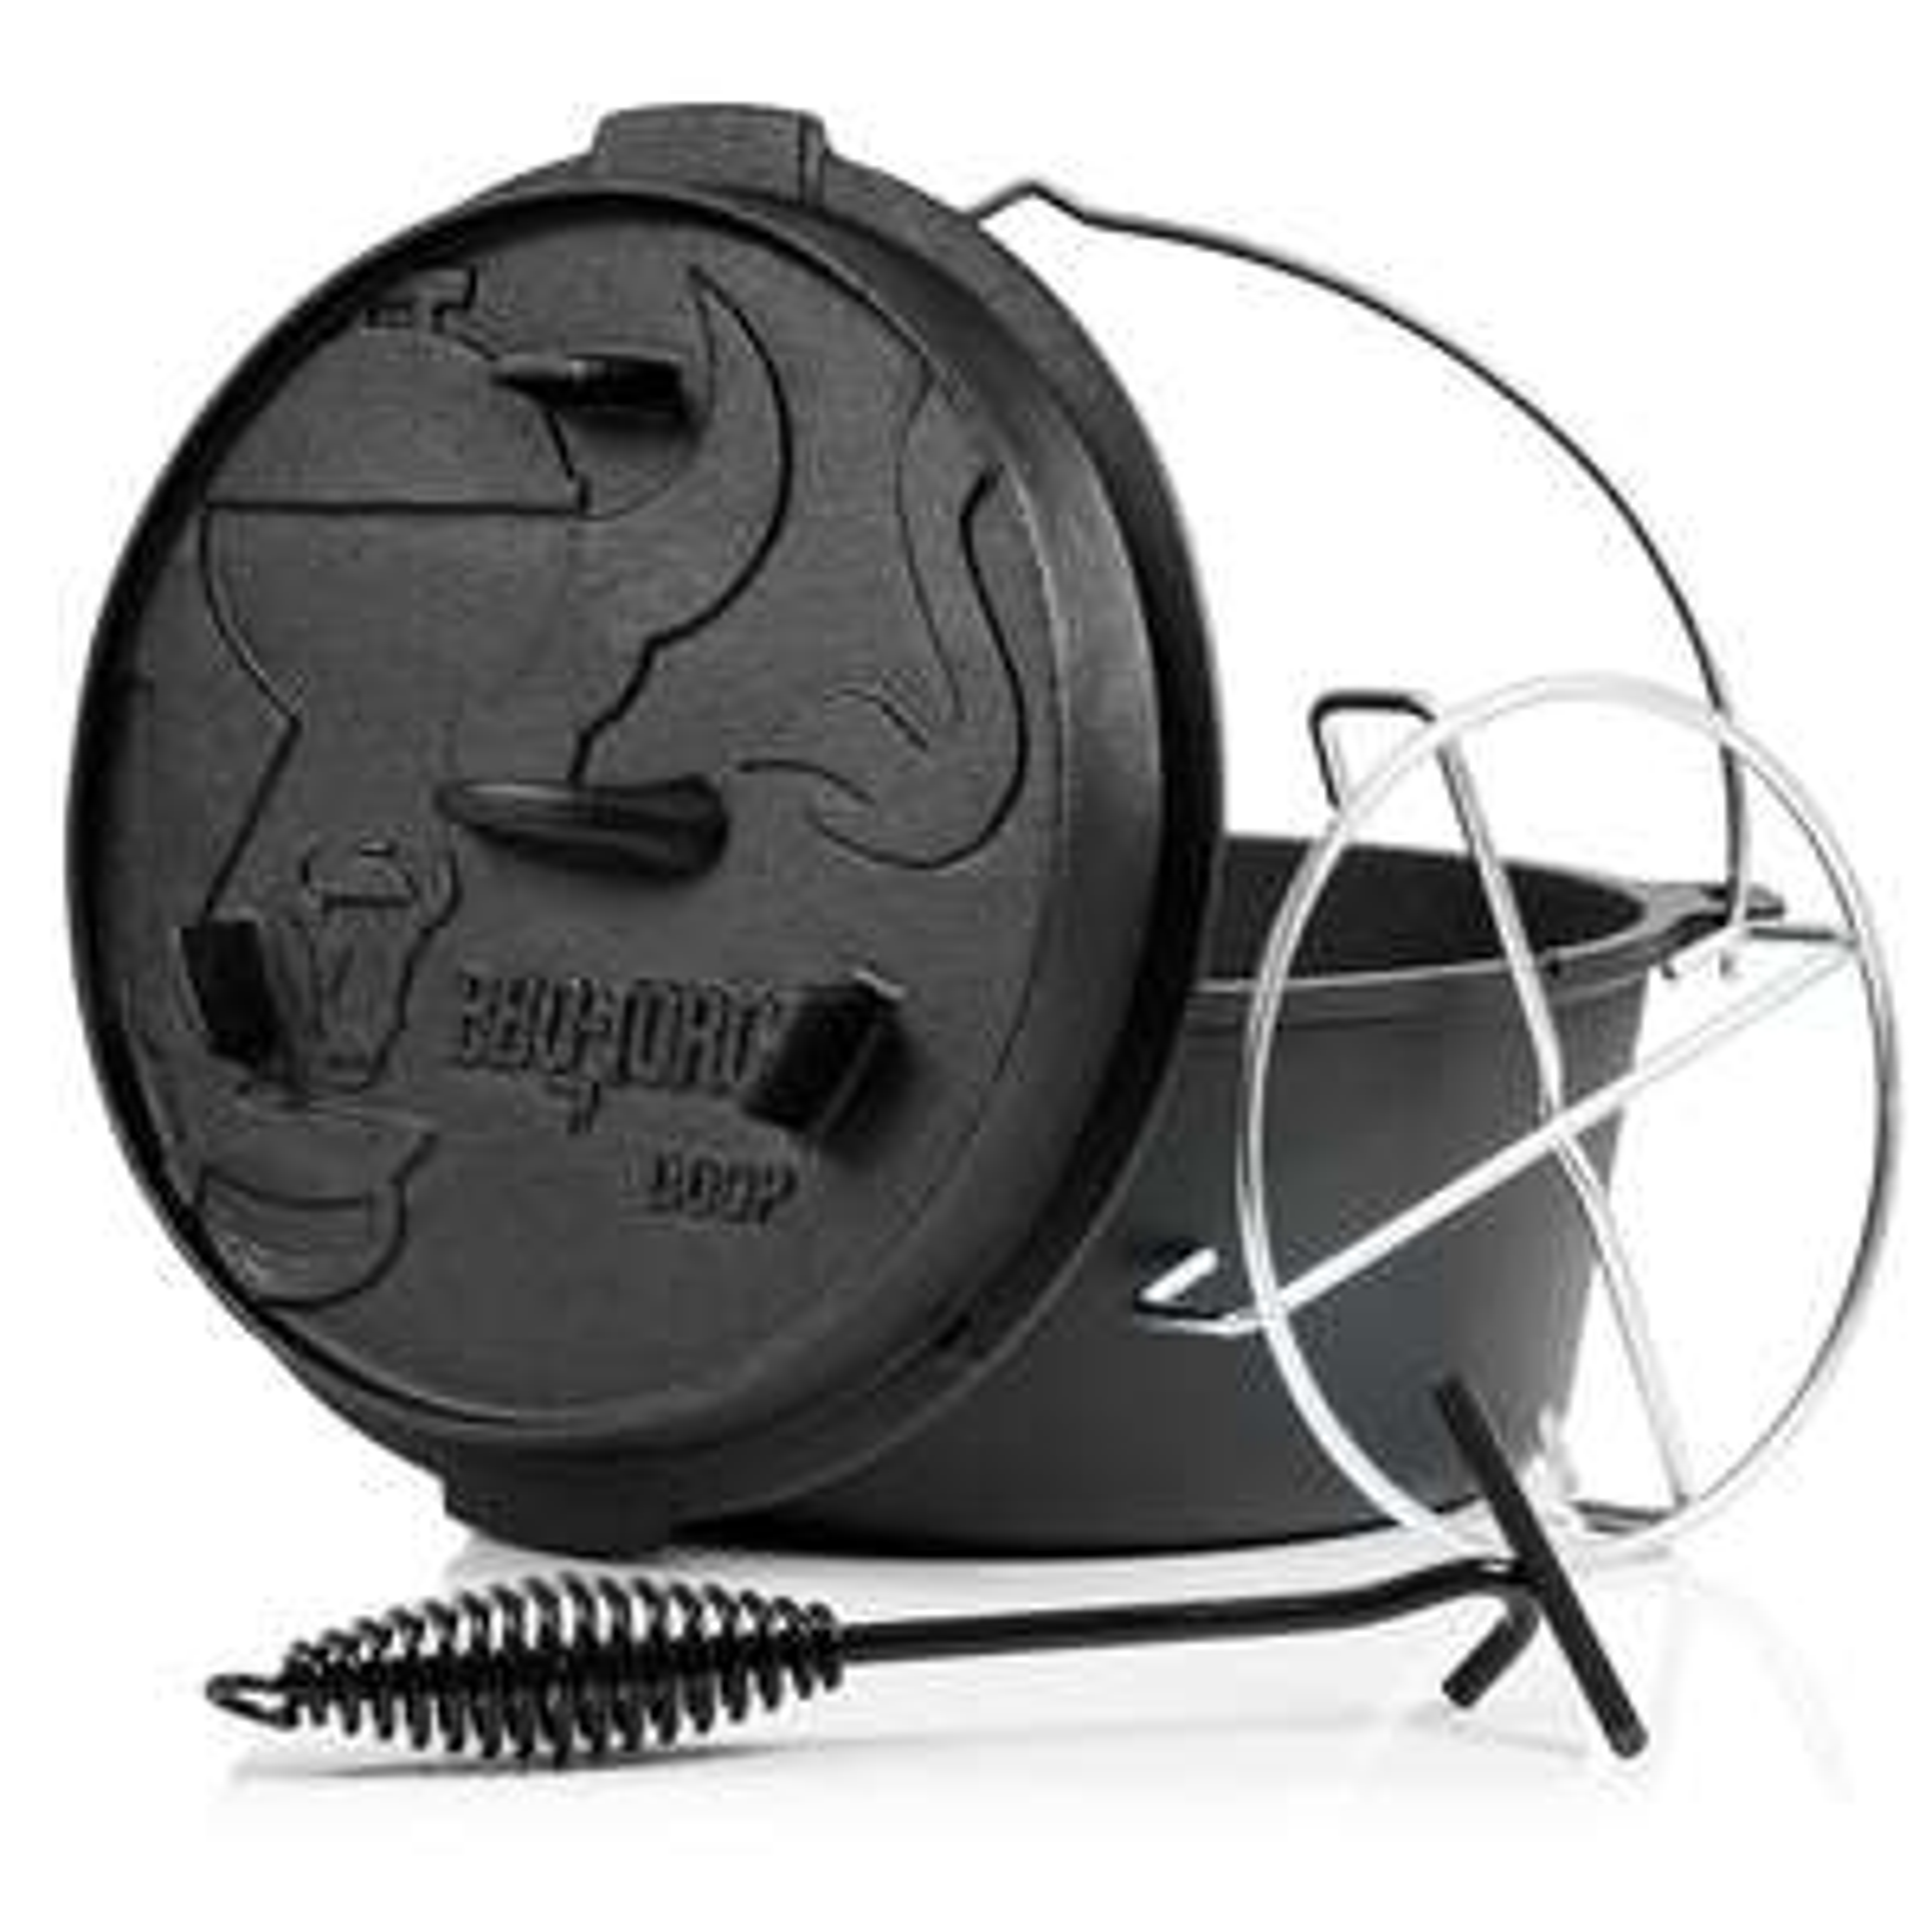 (Rakuten/Masterpass) BBQ-Toro Dutch Oven Premium Serie DO9P (9 Liter)